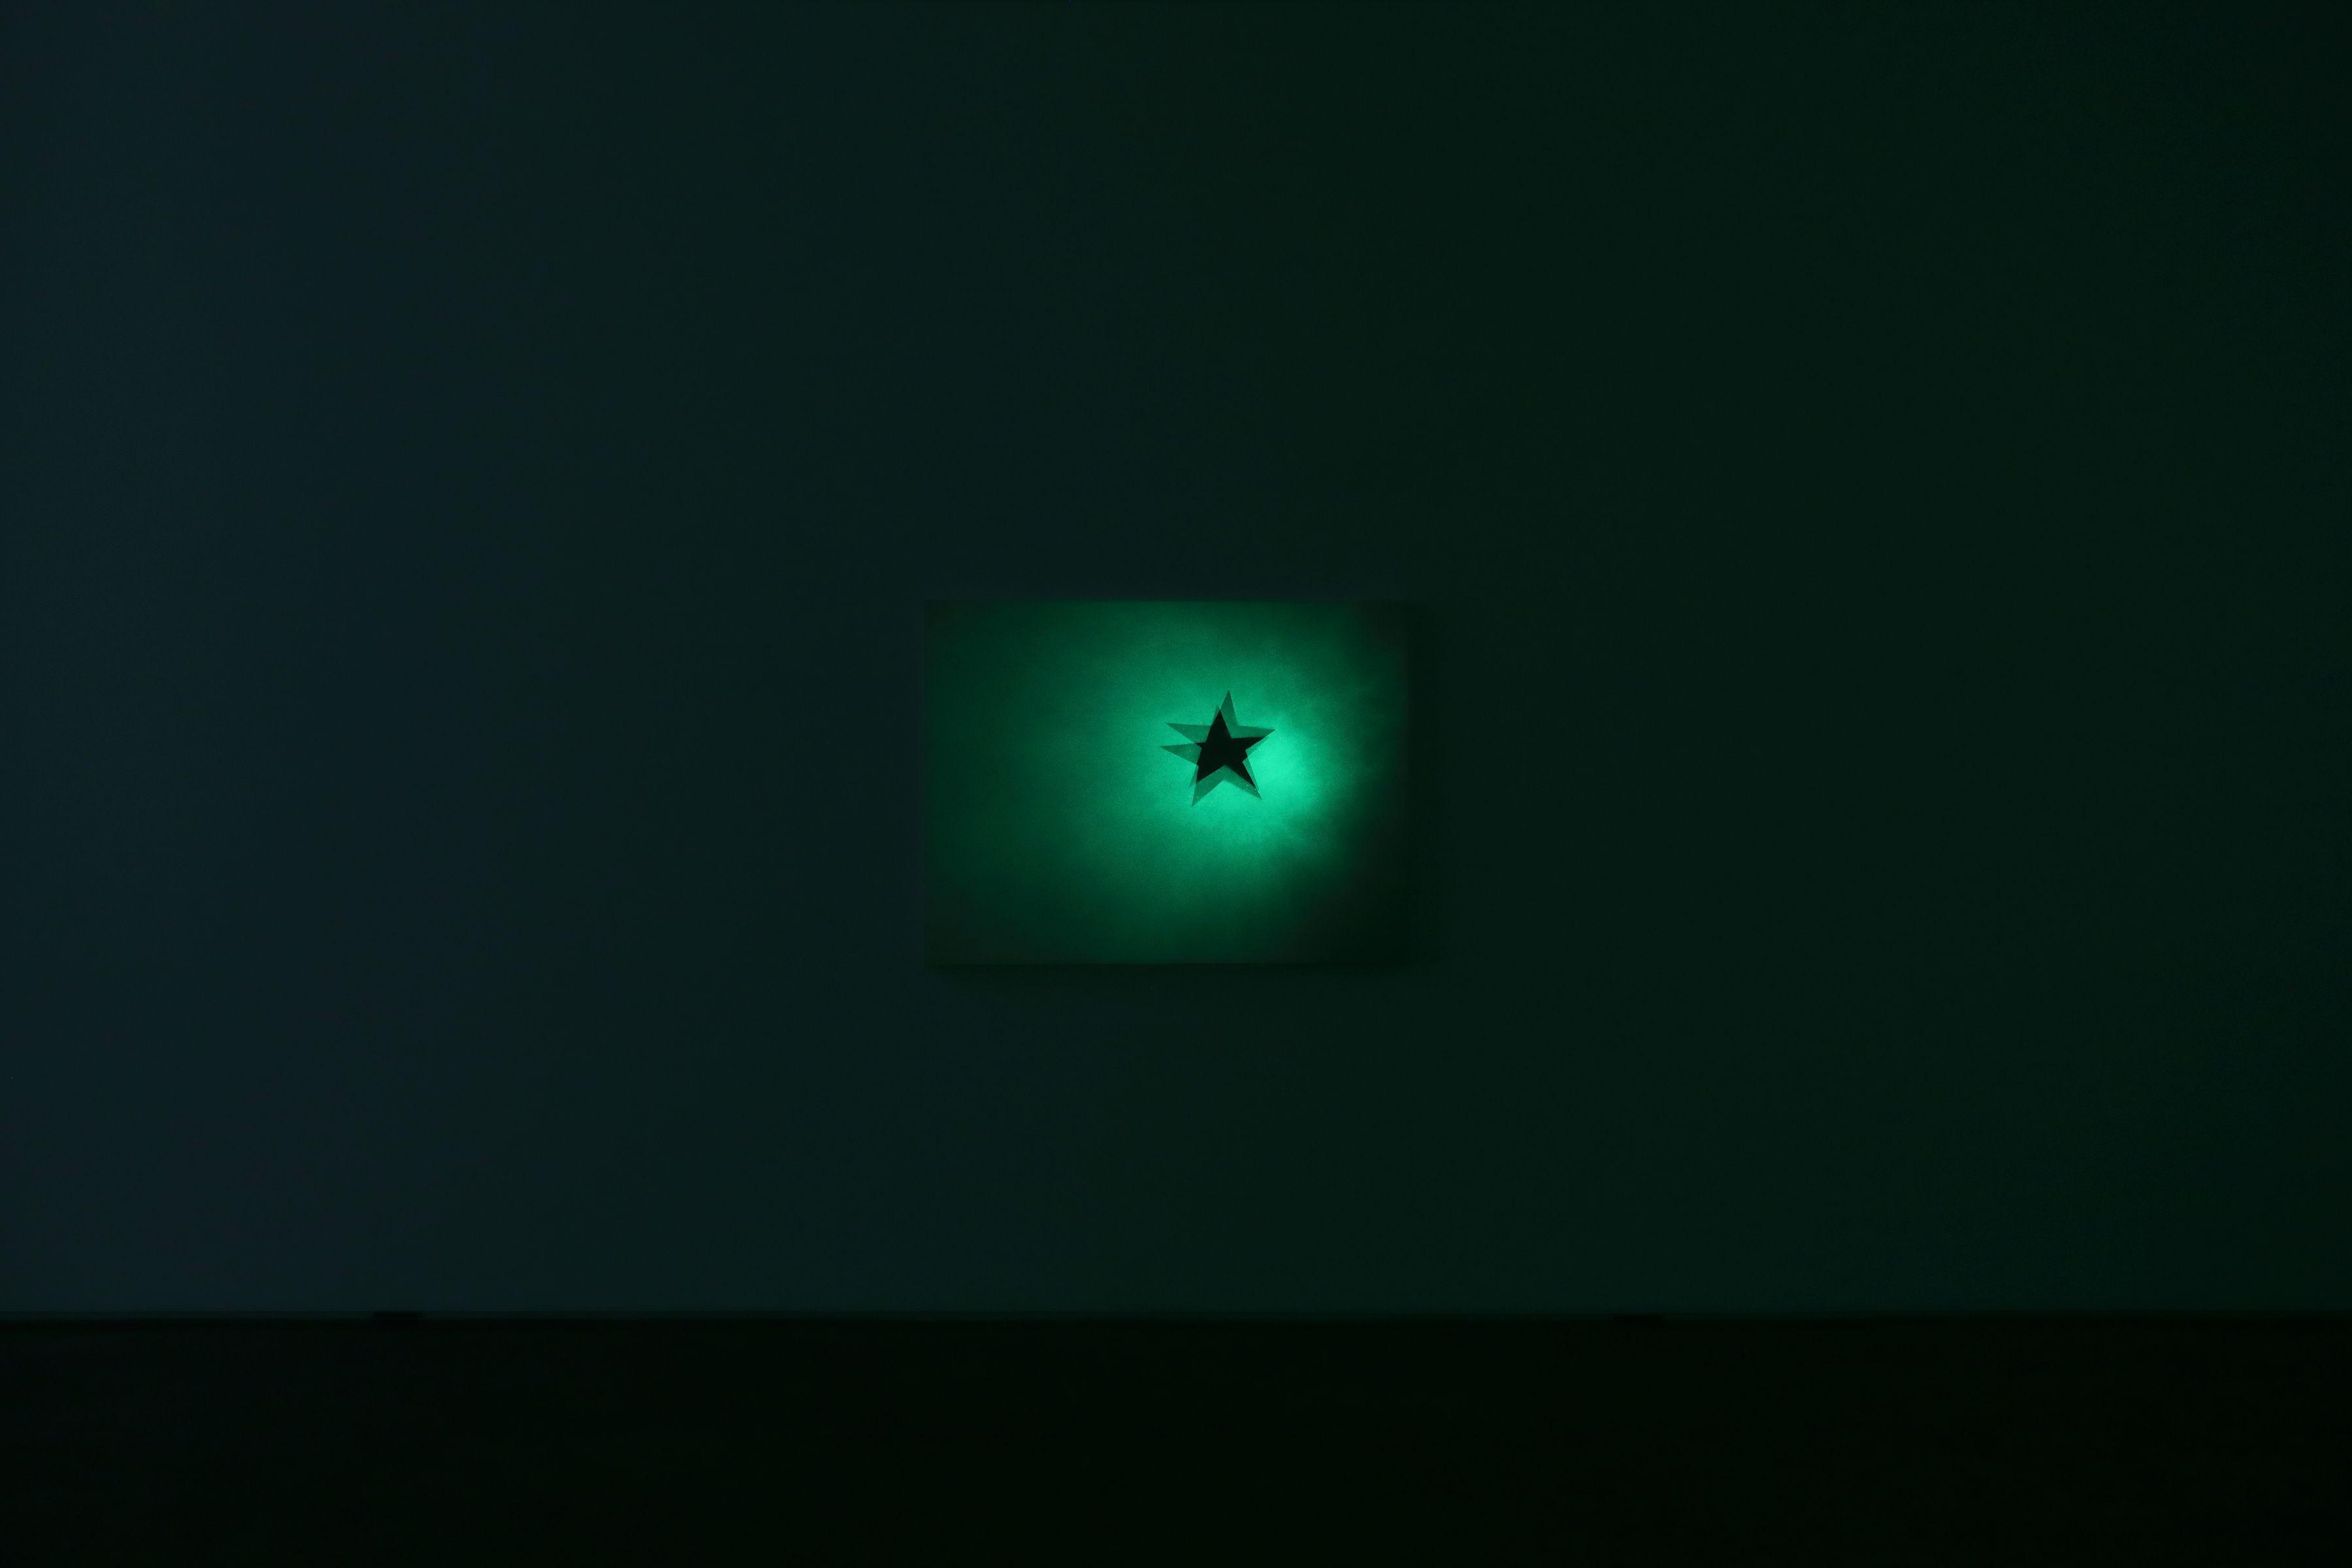 IMAGE(seven stars-lights on&off) 4